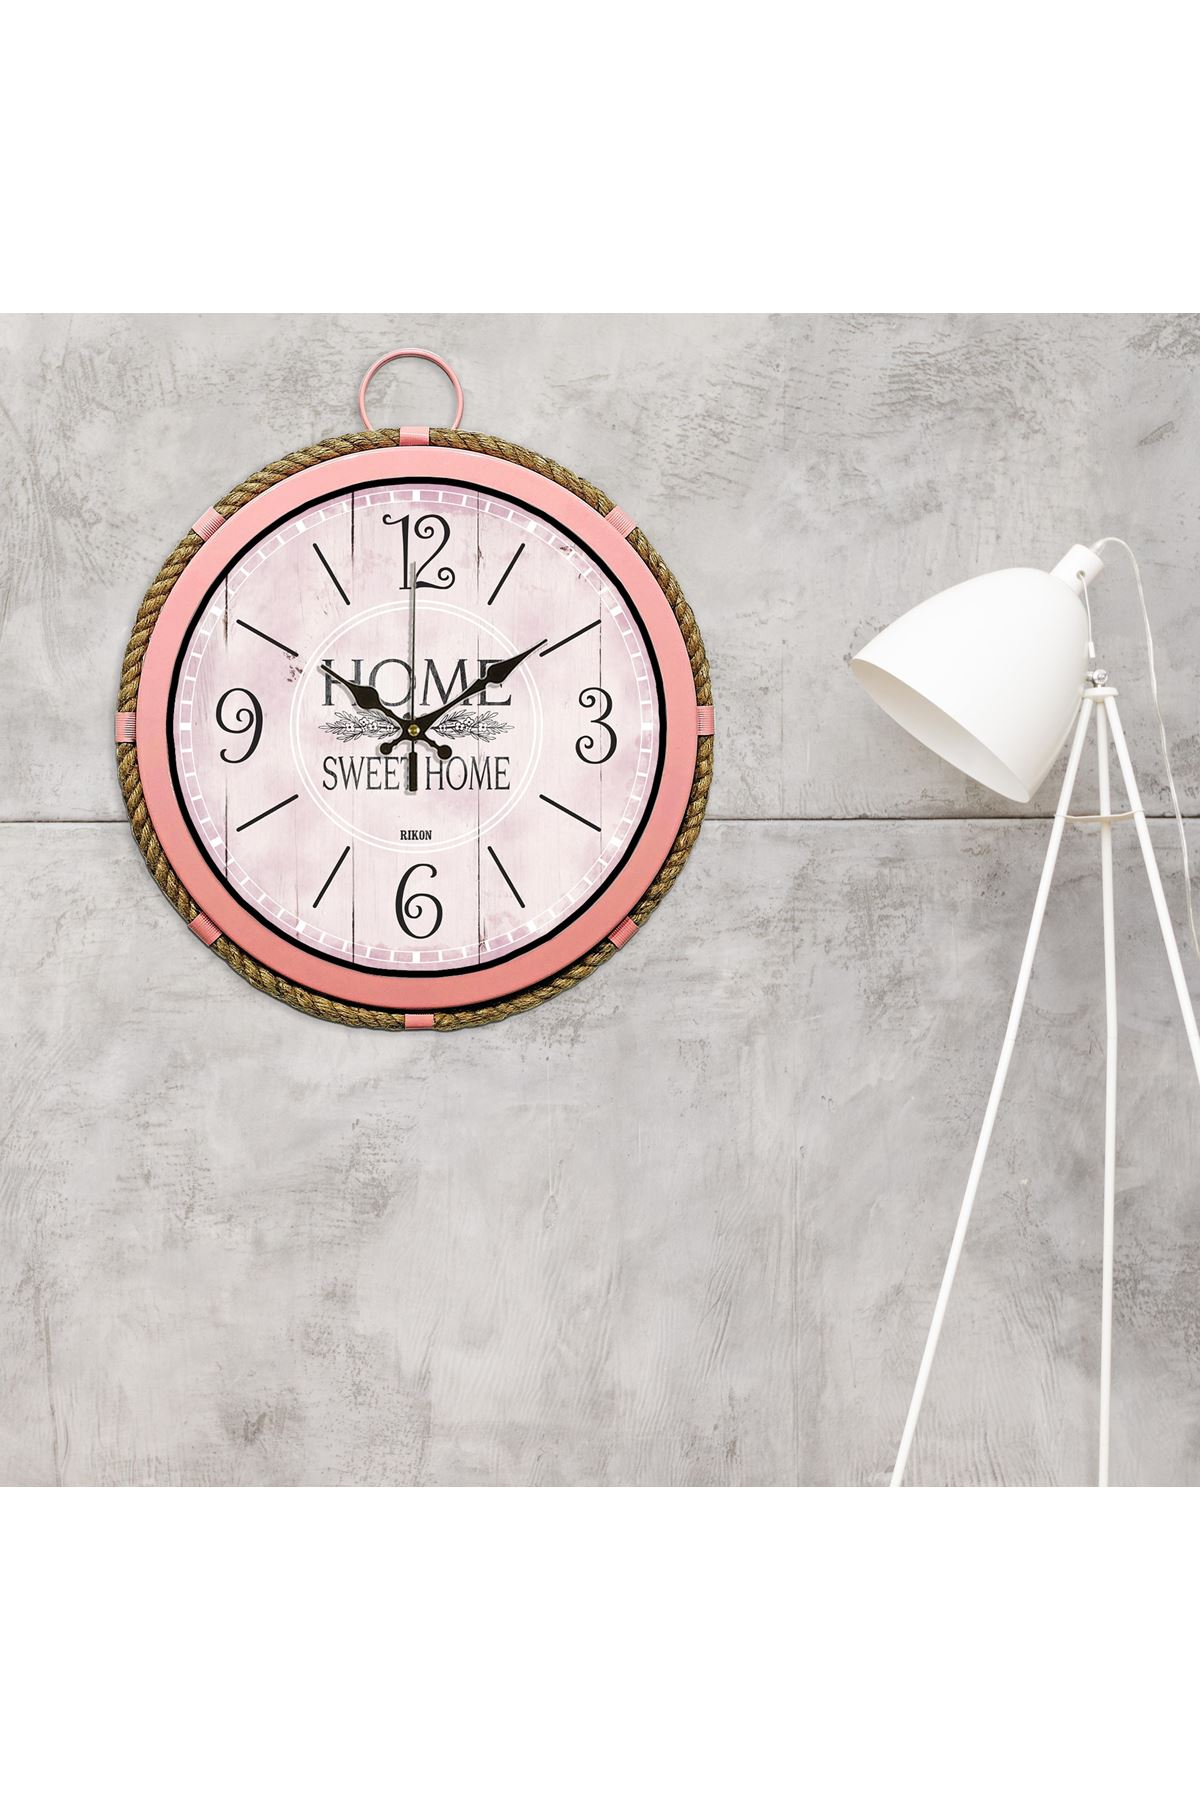 Rikon Metal Pembe Roma Rakamlı Halatlı Denizci Saati 35X35 Cm